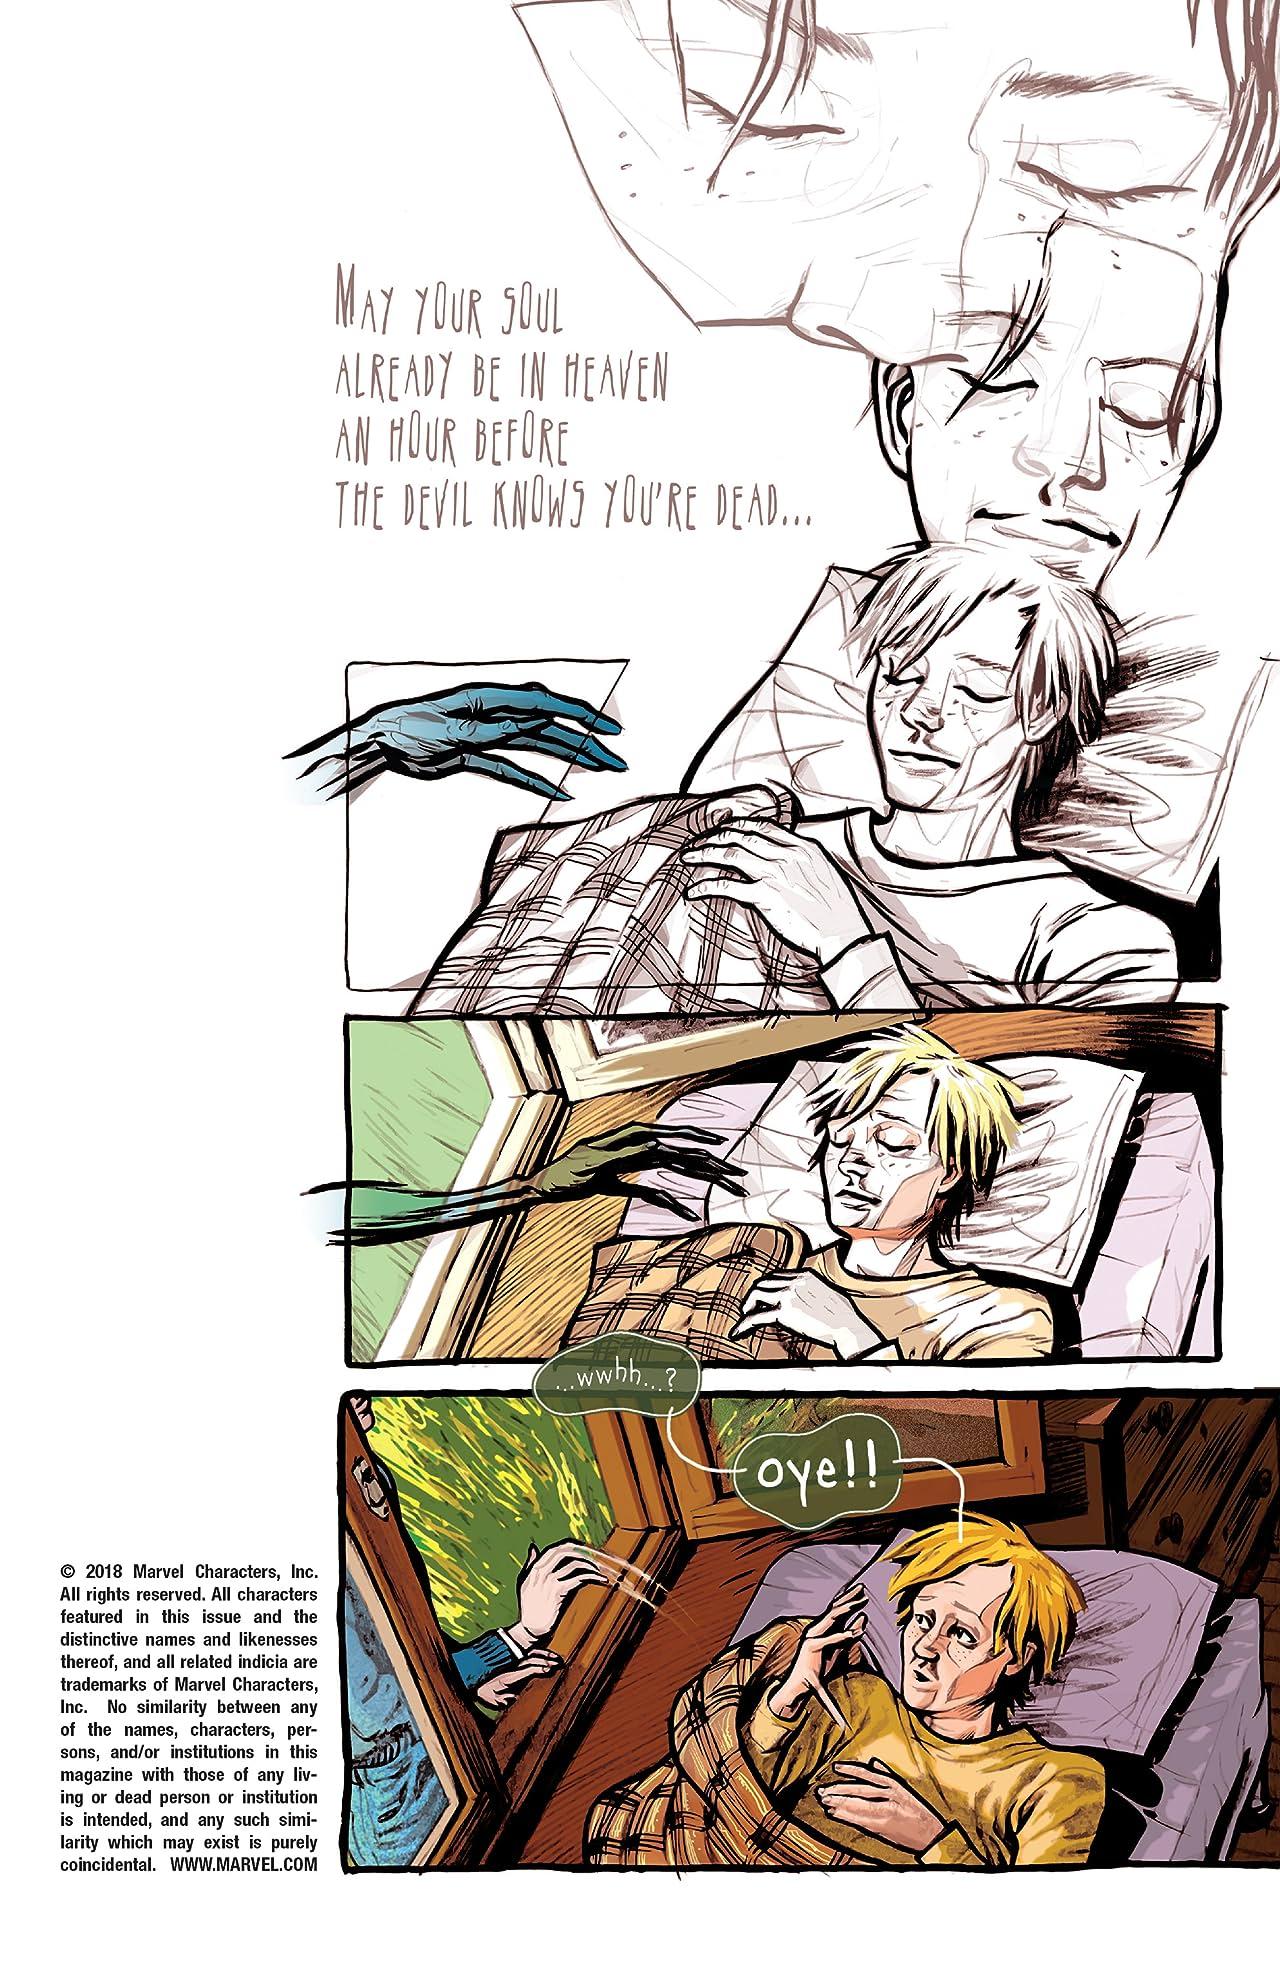 Muties (2002) #6